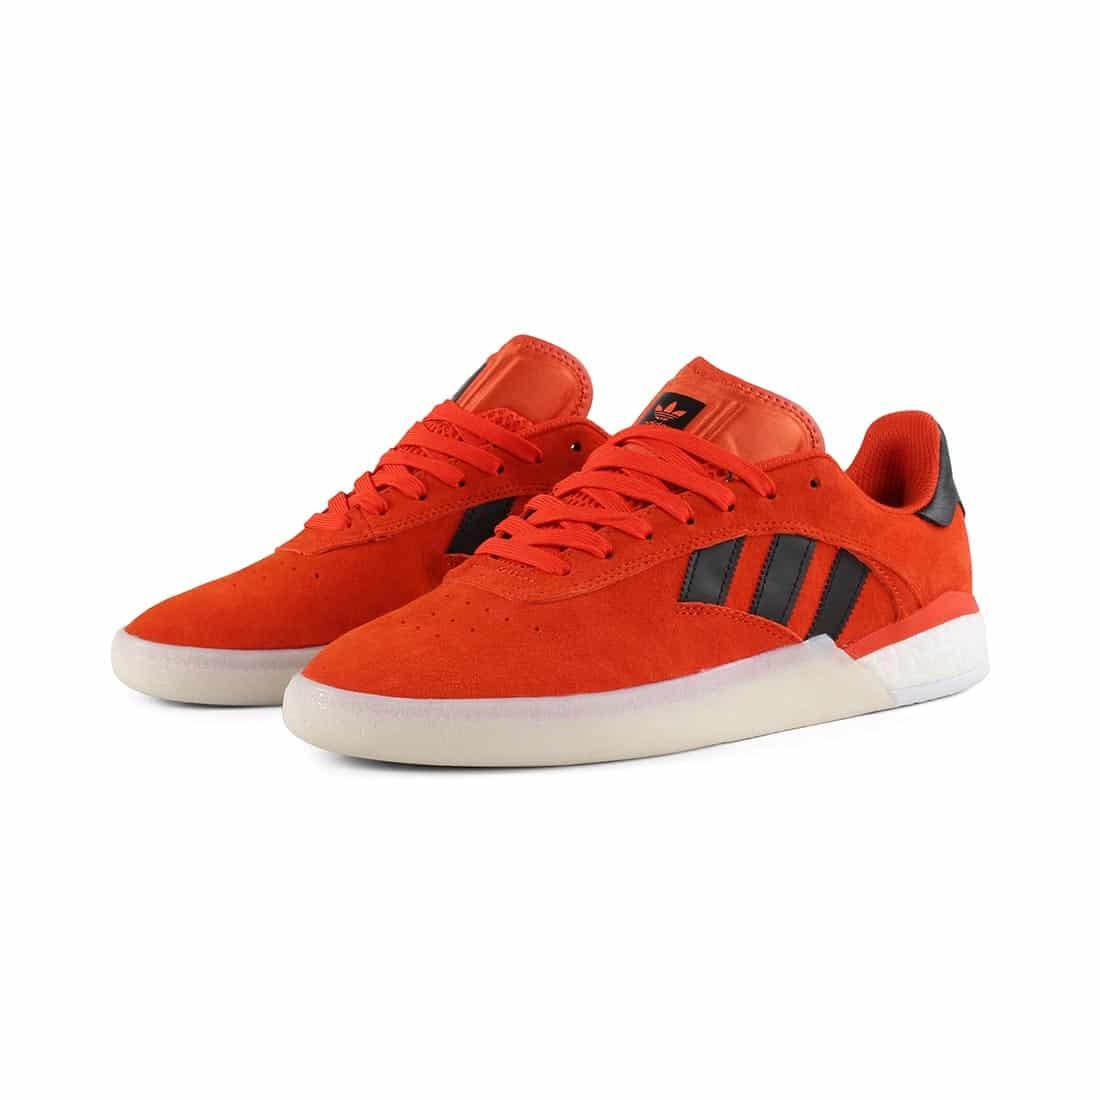 Adidas 3ST.004 Shoes – Collegiate Orange / Core Black / White